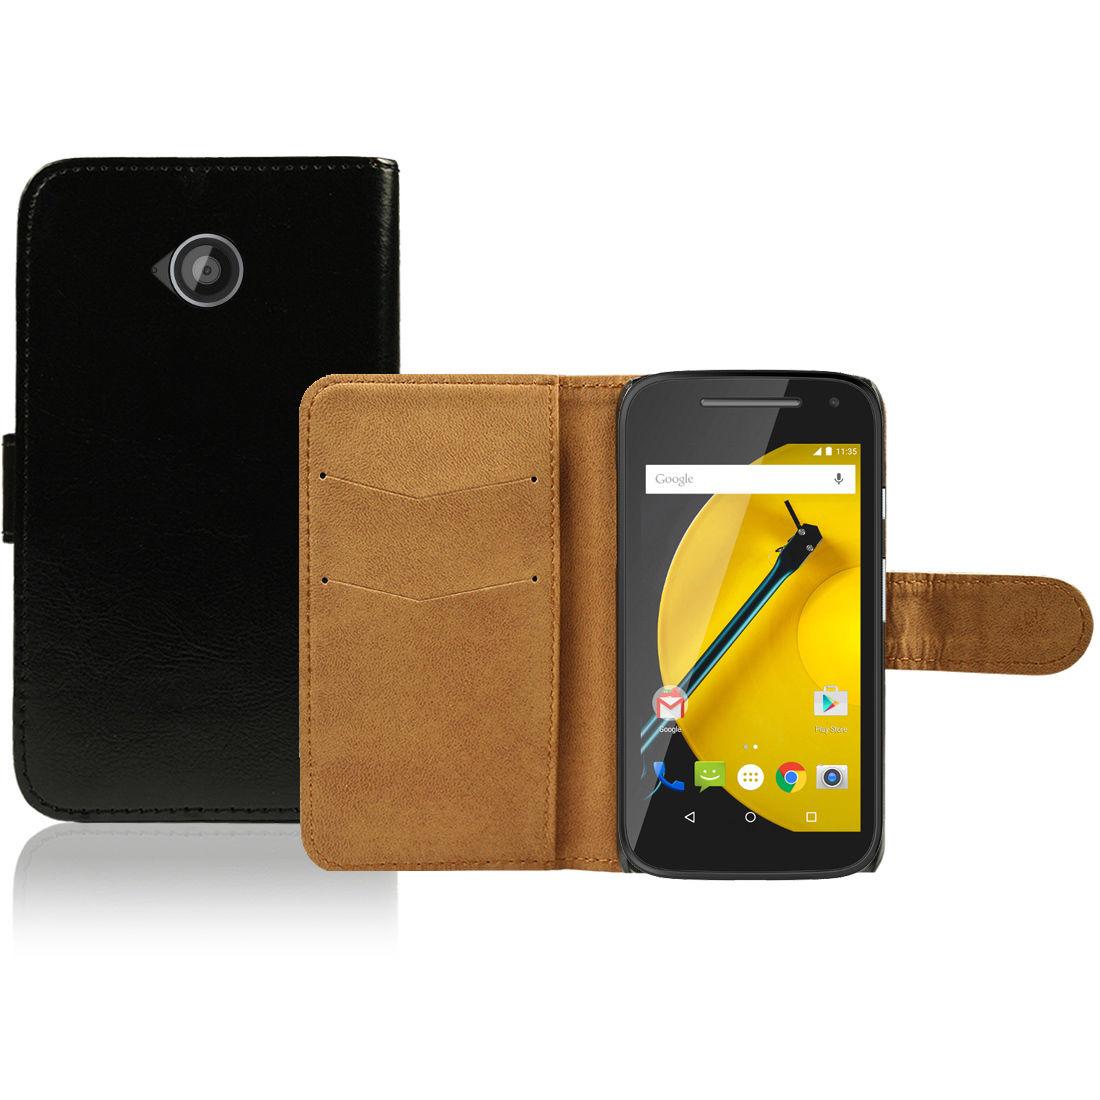 Pouzdro pro Motorola Moto E (2nd Gen)